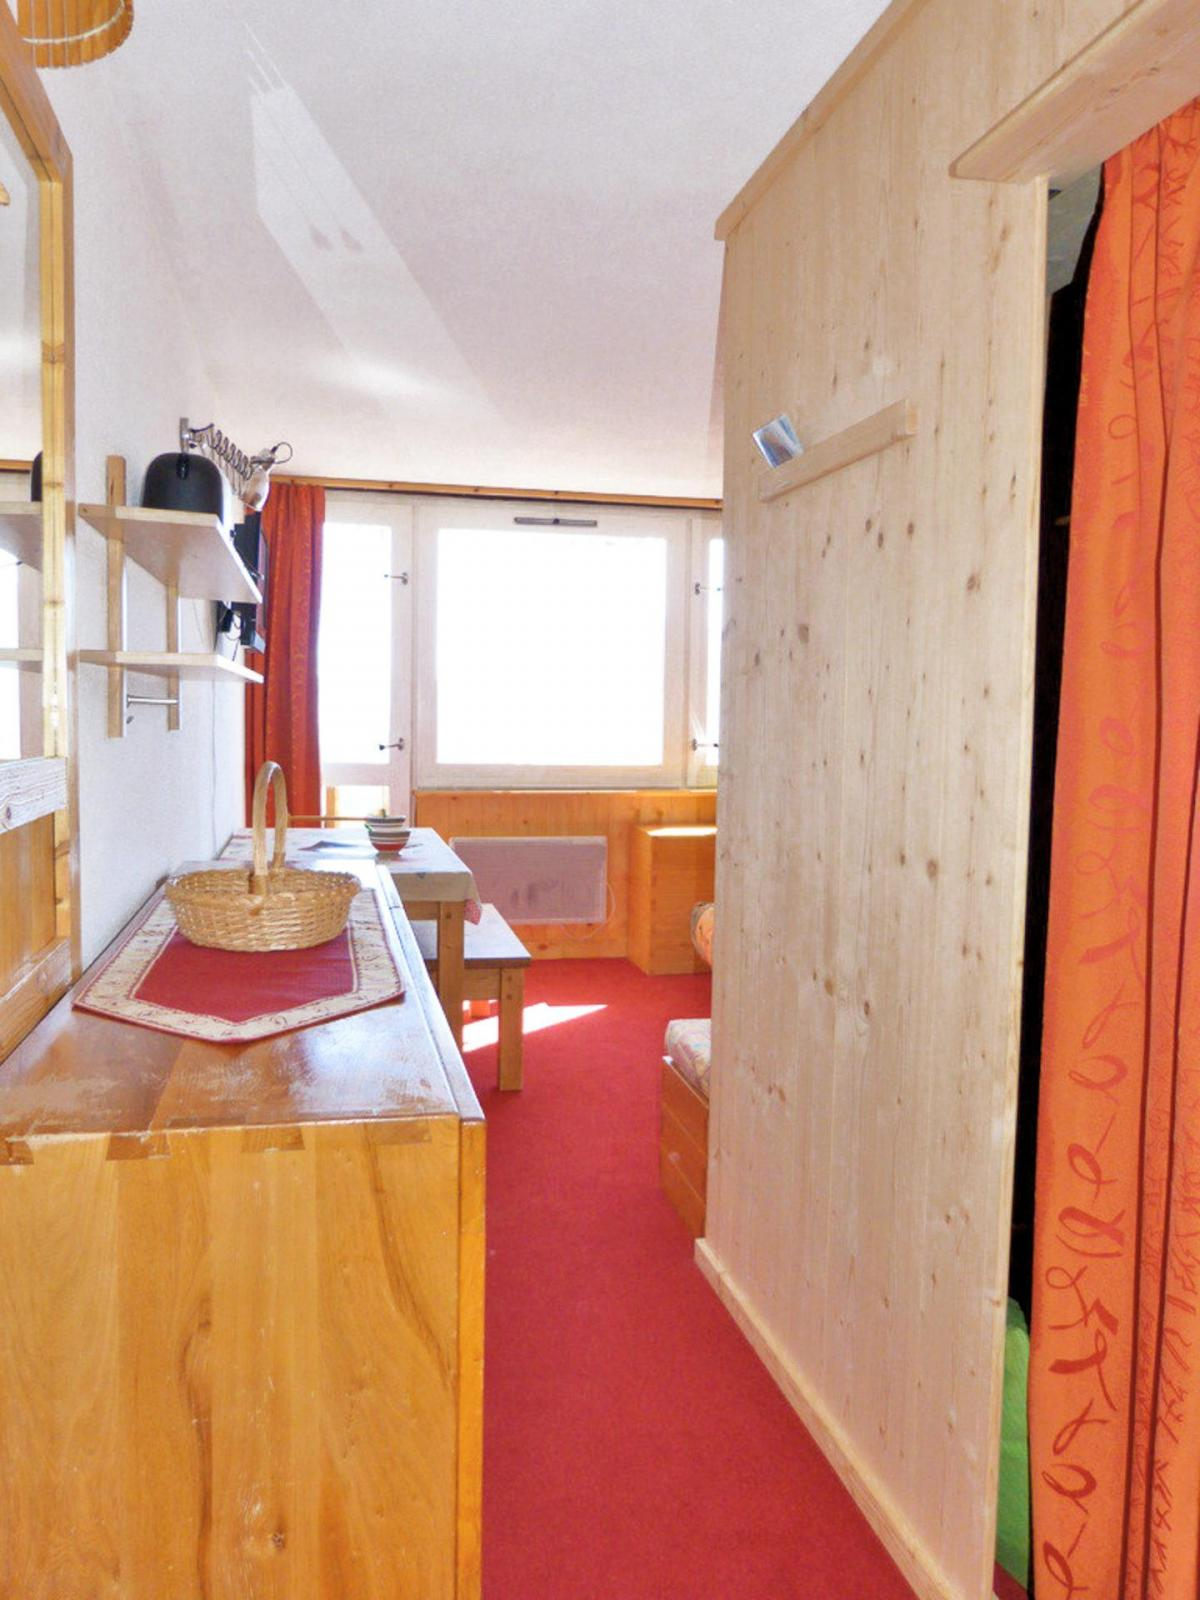 Location au ski Studio cabine 4 personnes (A2M156) - Residence Aime 2000 - Le Diamant - La Plagne - Cabine